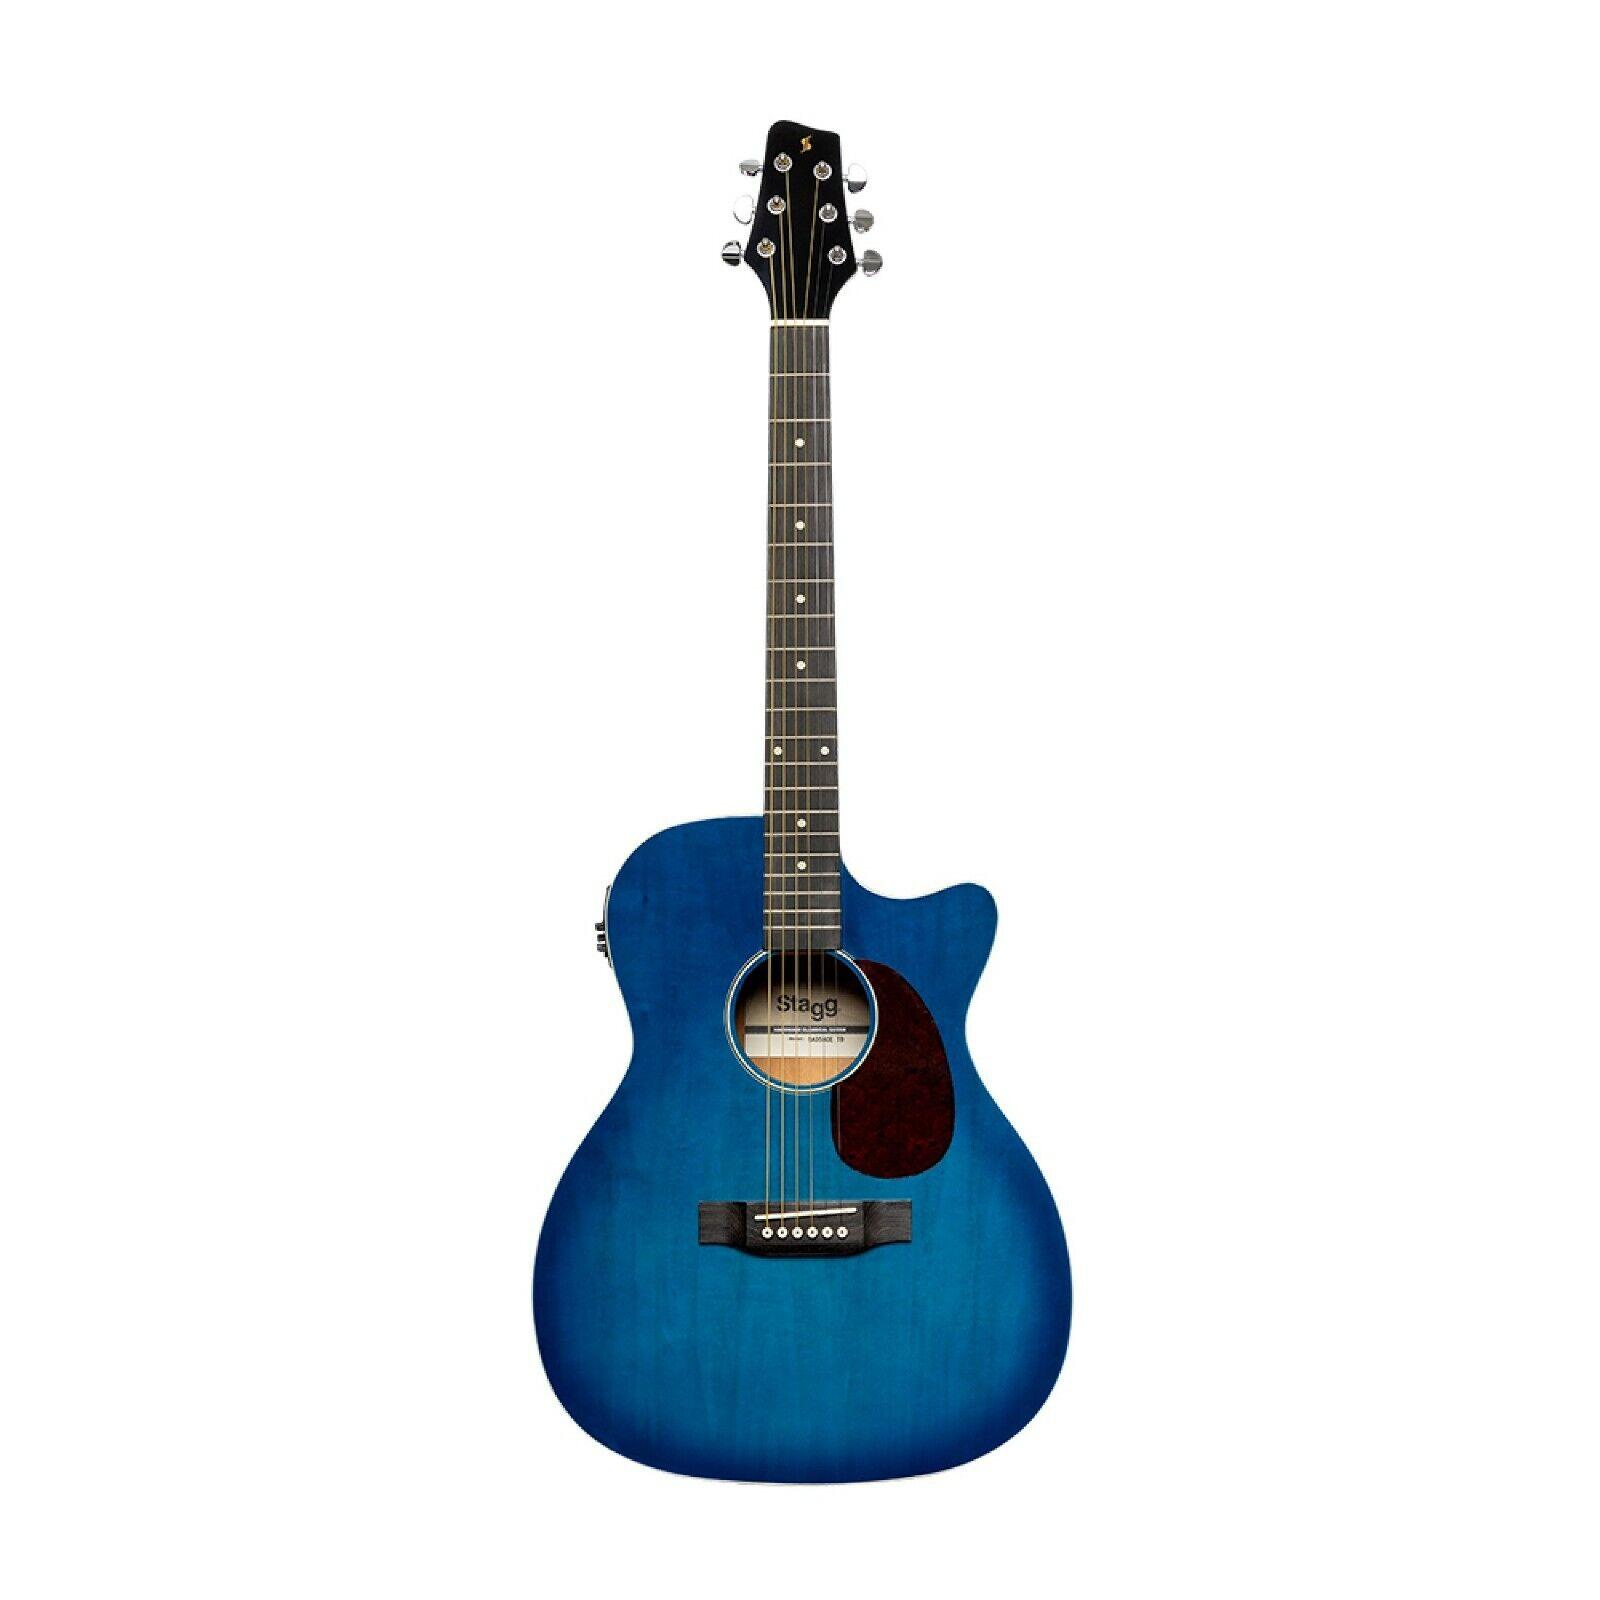 SA35 ACE-TBCutaway, akustisch-elektrische Auditorium Gitarre, Transparent Blau